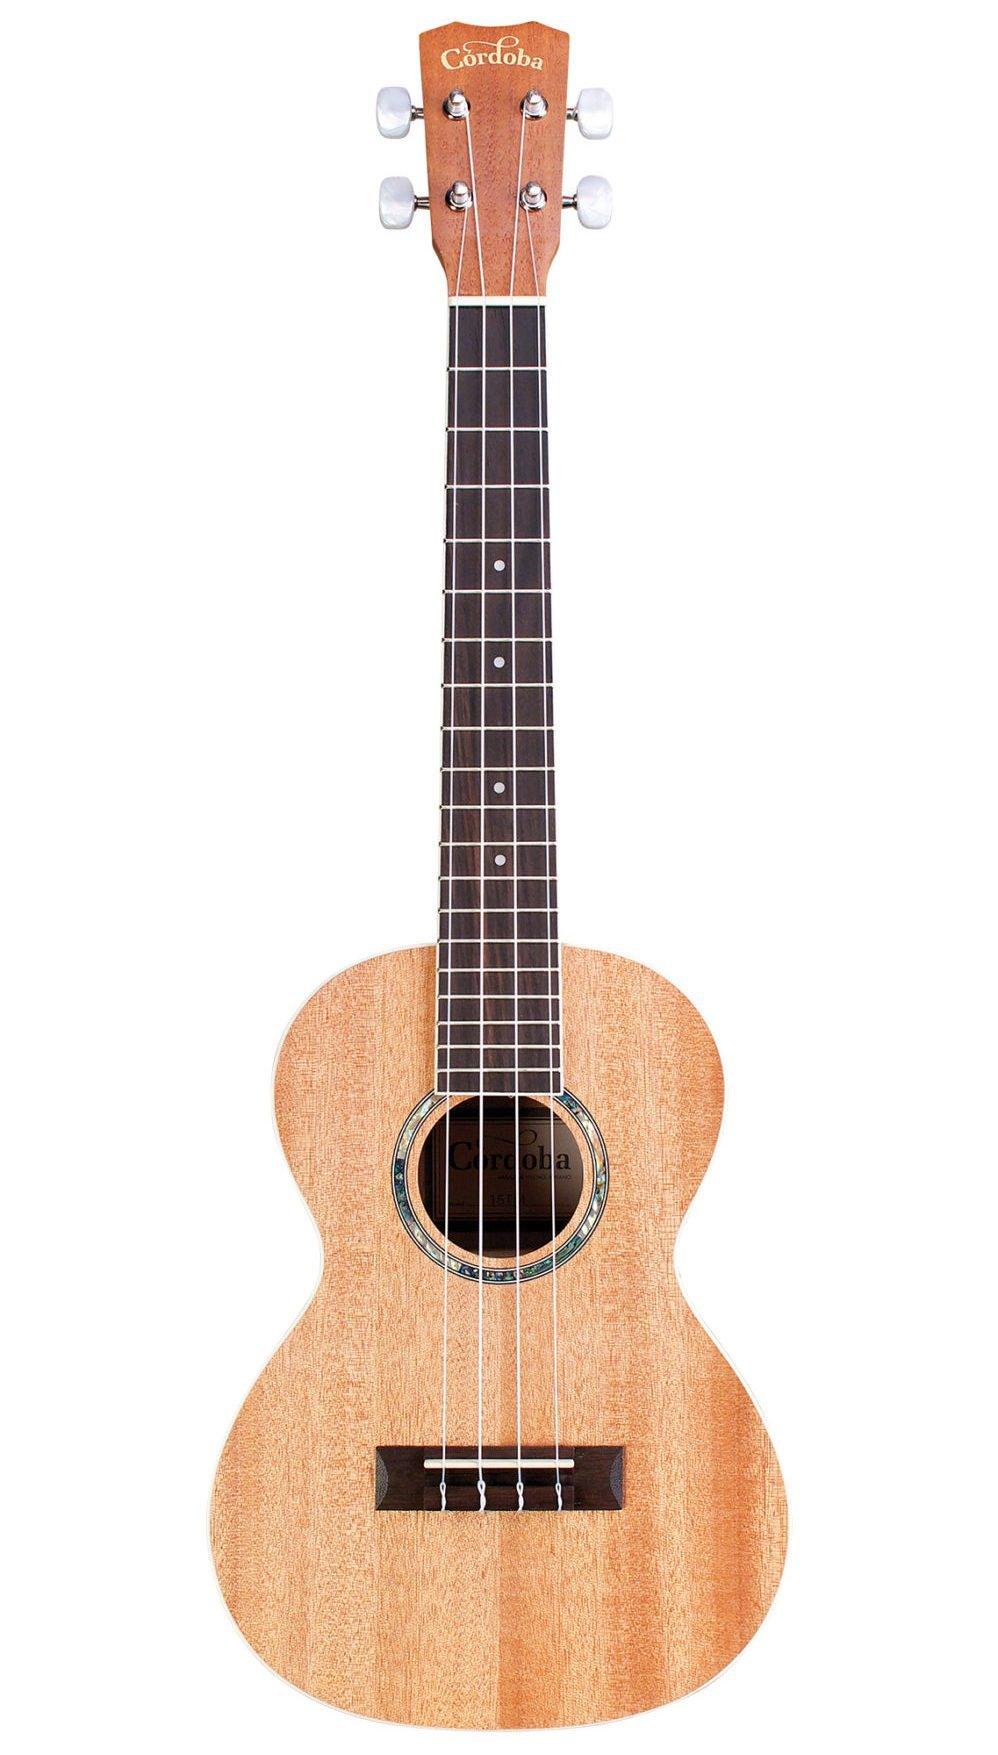 Cordoba Guitars 15TM Tenor Ukulele